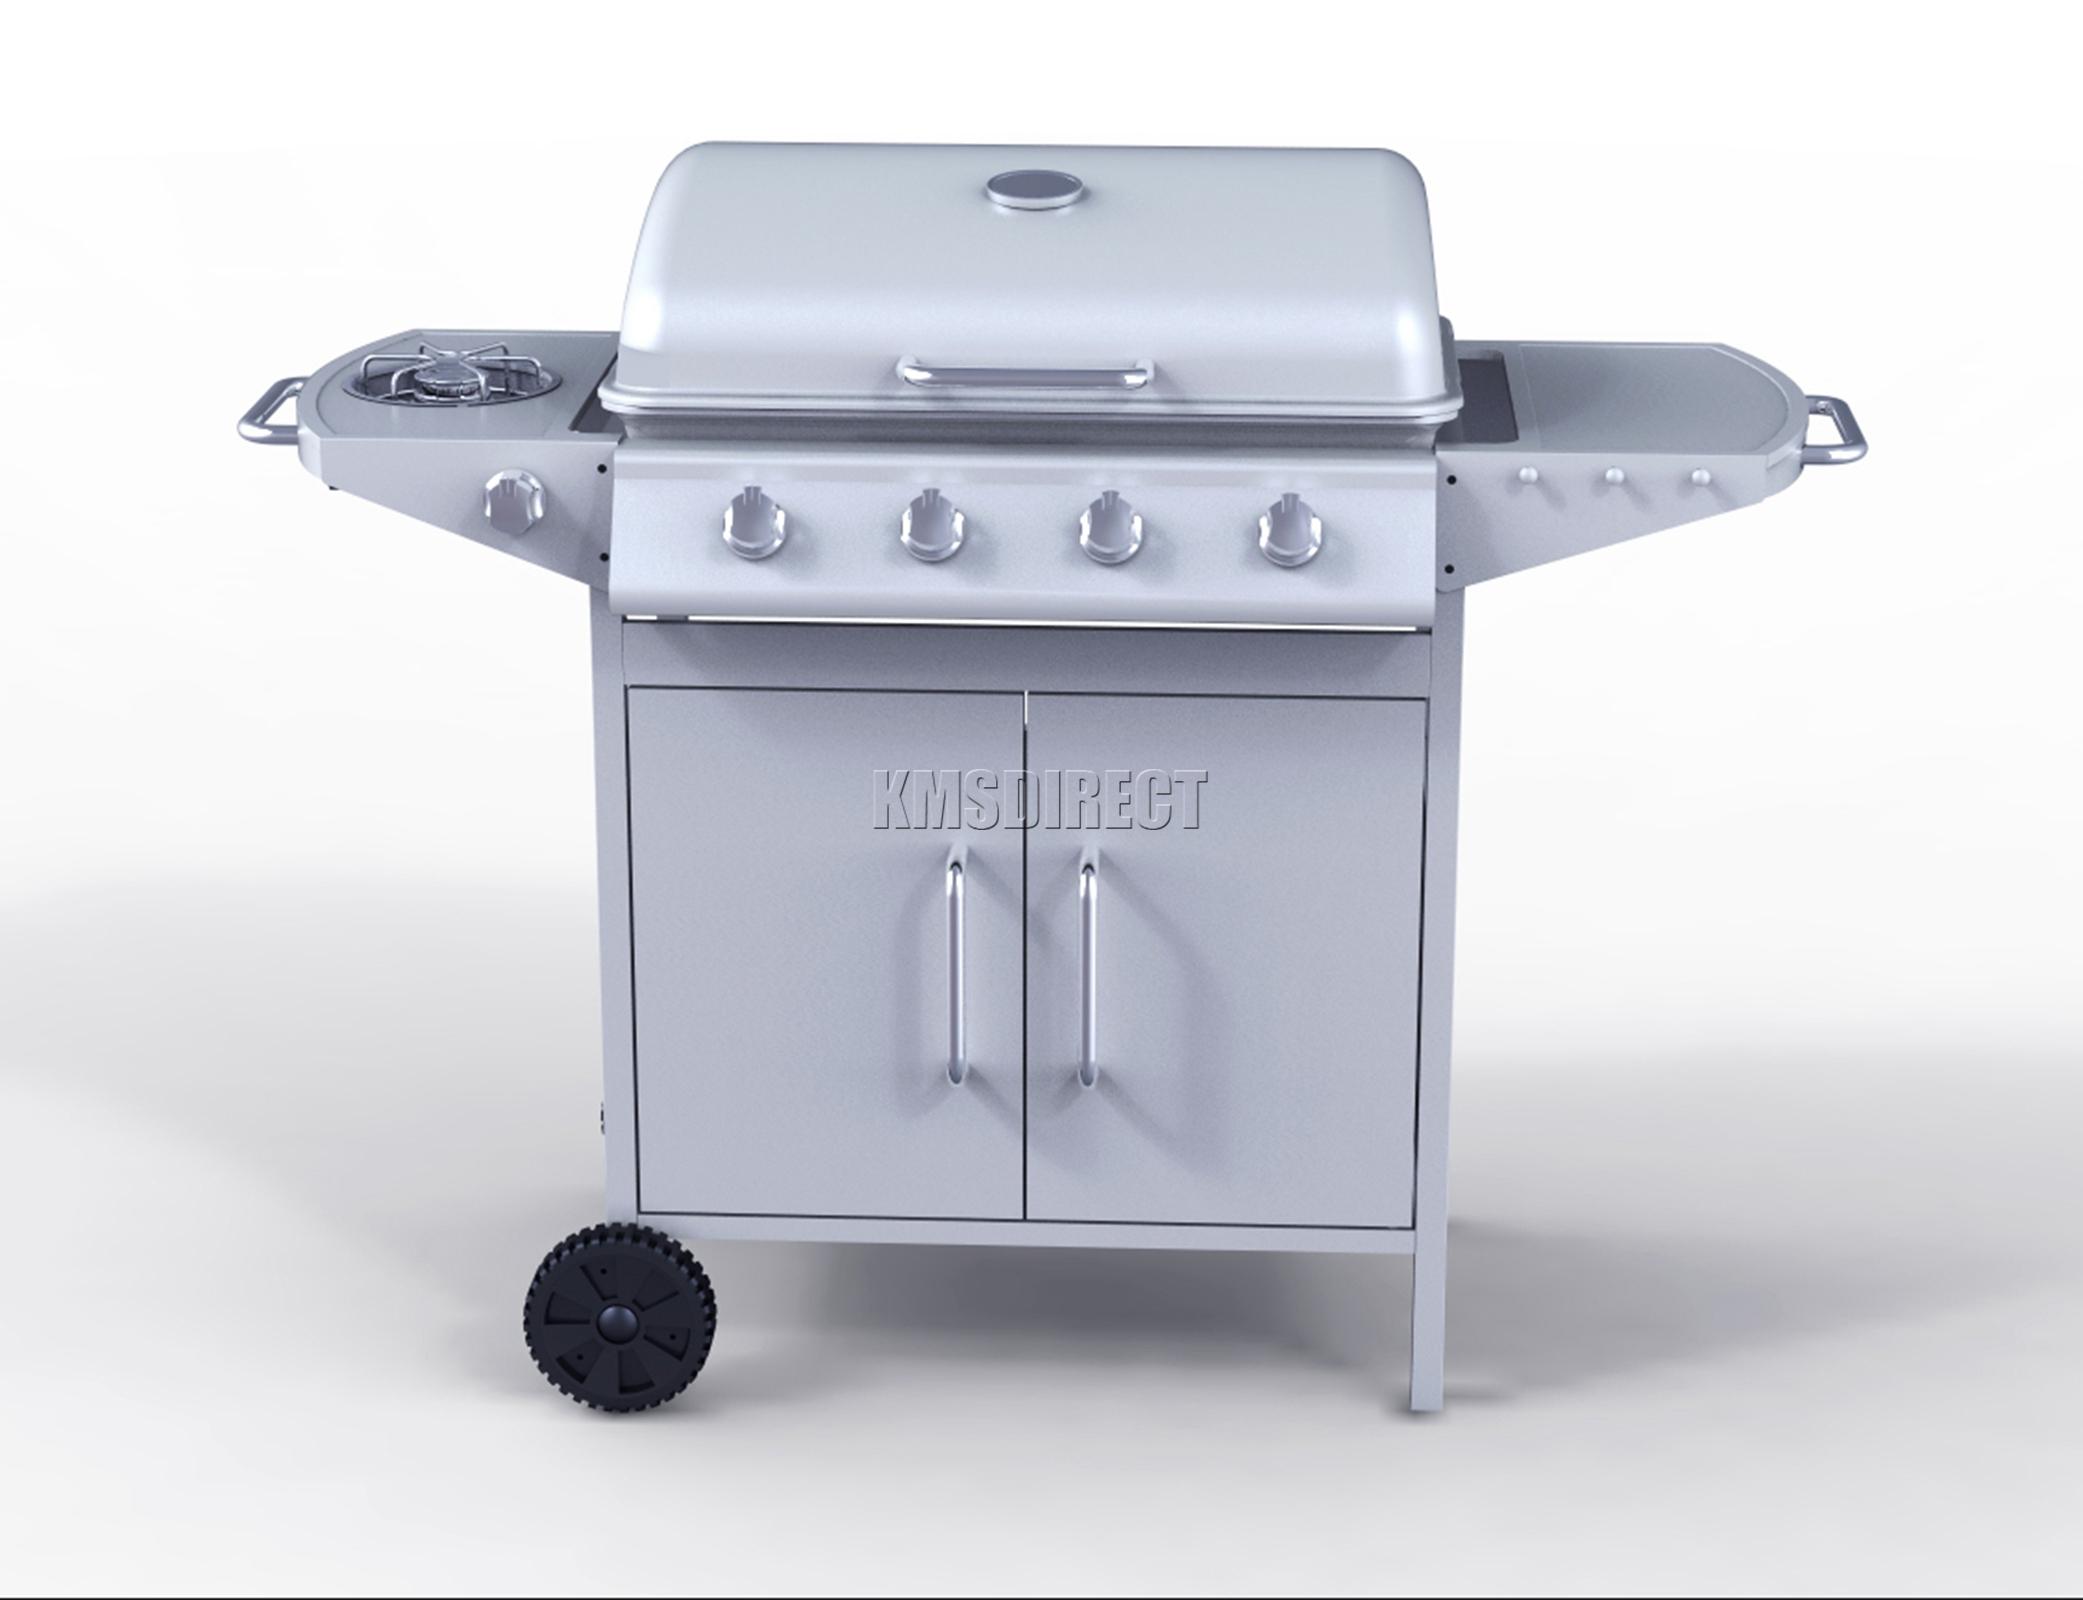 foxhunter g2087d 4 burner bbq gas grill silver steel. Black Bedroom Furniture Sets. Home Design Ideas